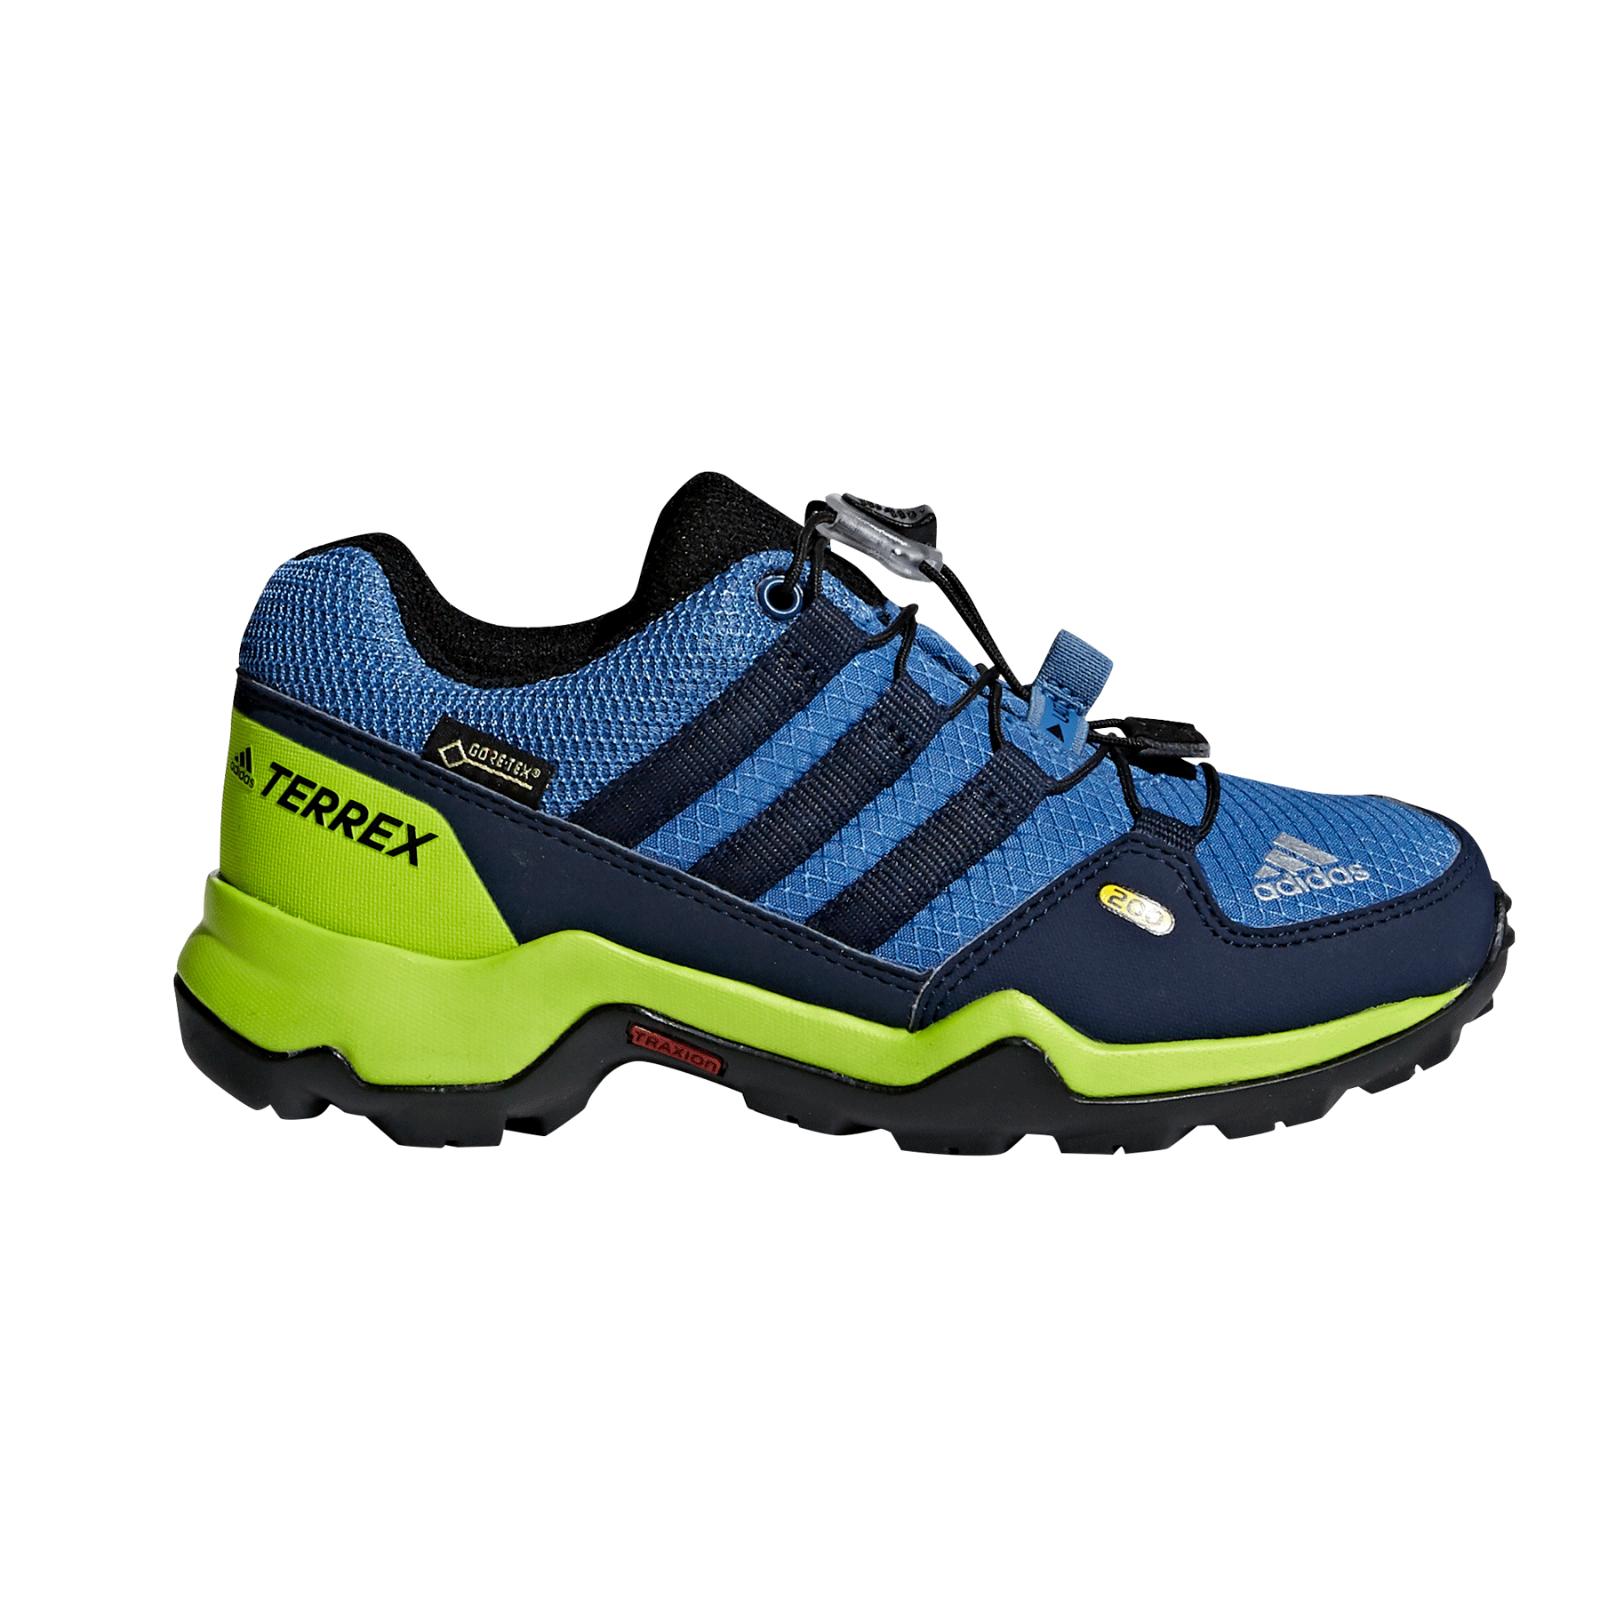 Adidas Terrex GTX K 39 Wander-/ Freizeit-/ Winter-/ Kinderschuhe NEU UVP*89,95€